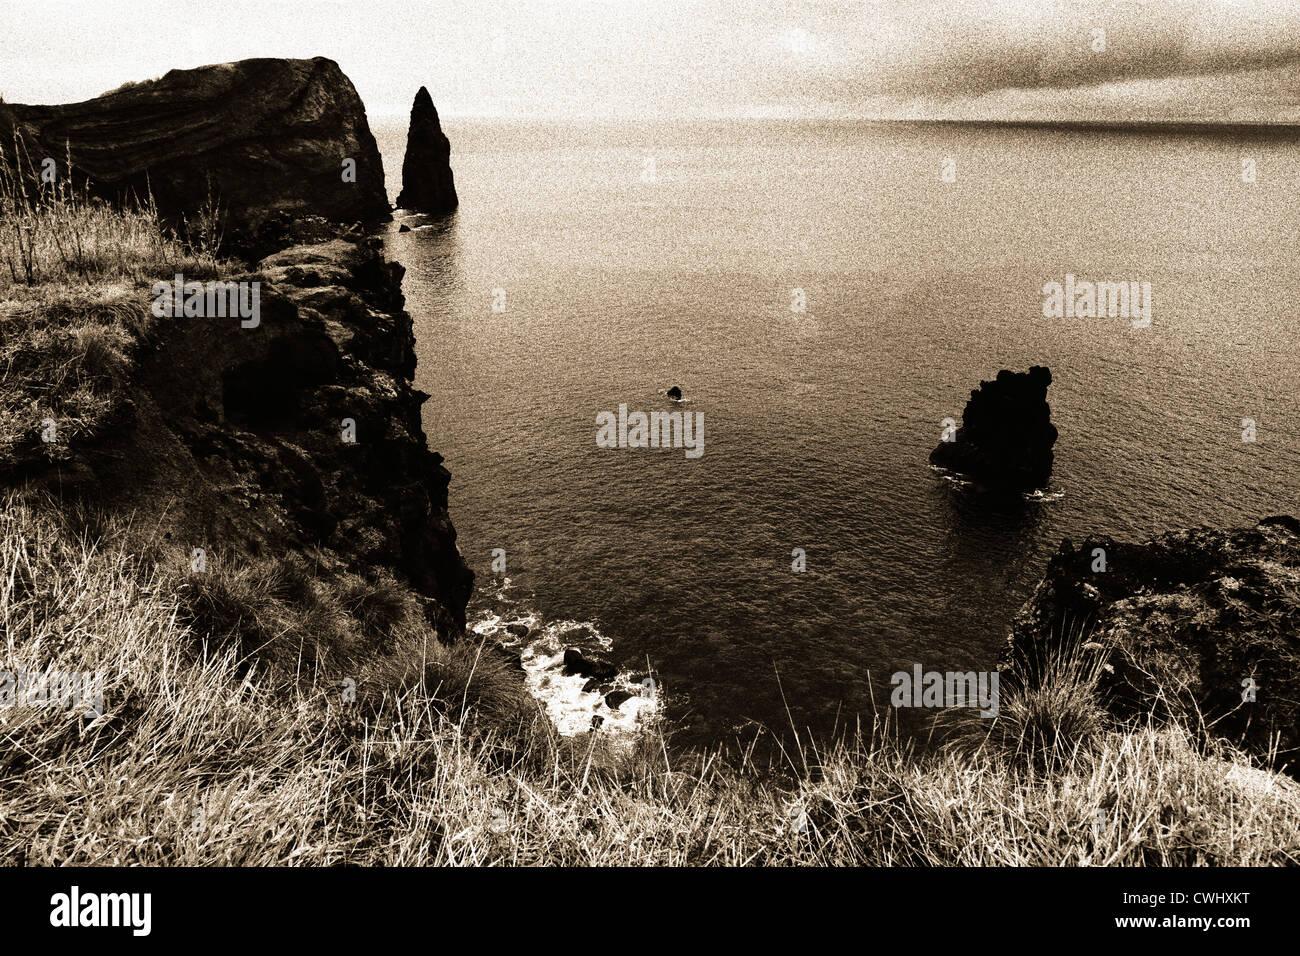 Coastal landscape from Sao Miguel island on sepia tones. Azores islands; Portugal. - Stock Image